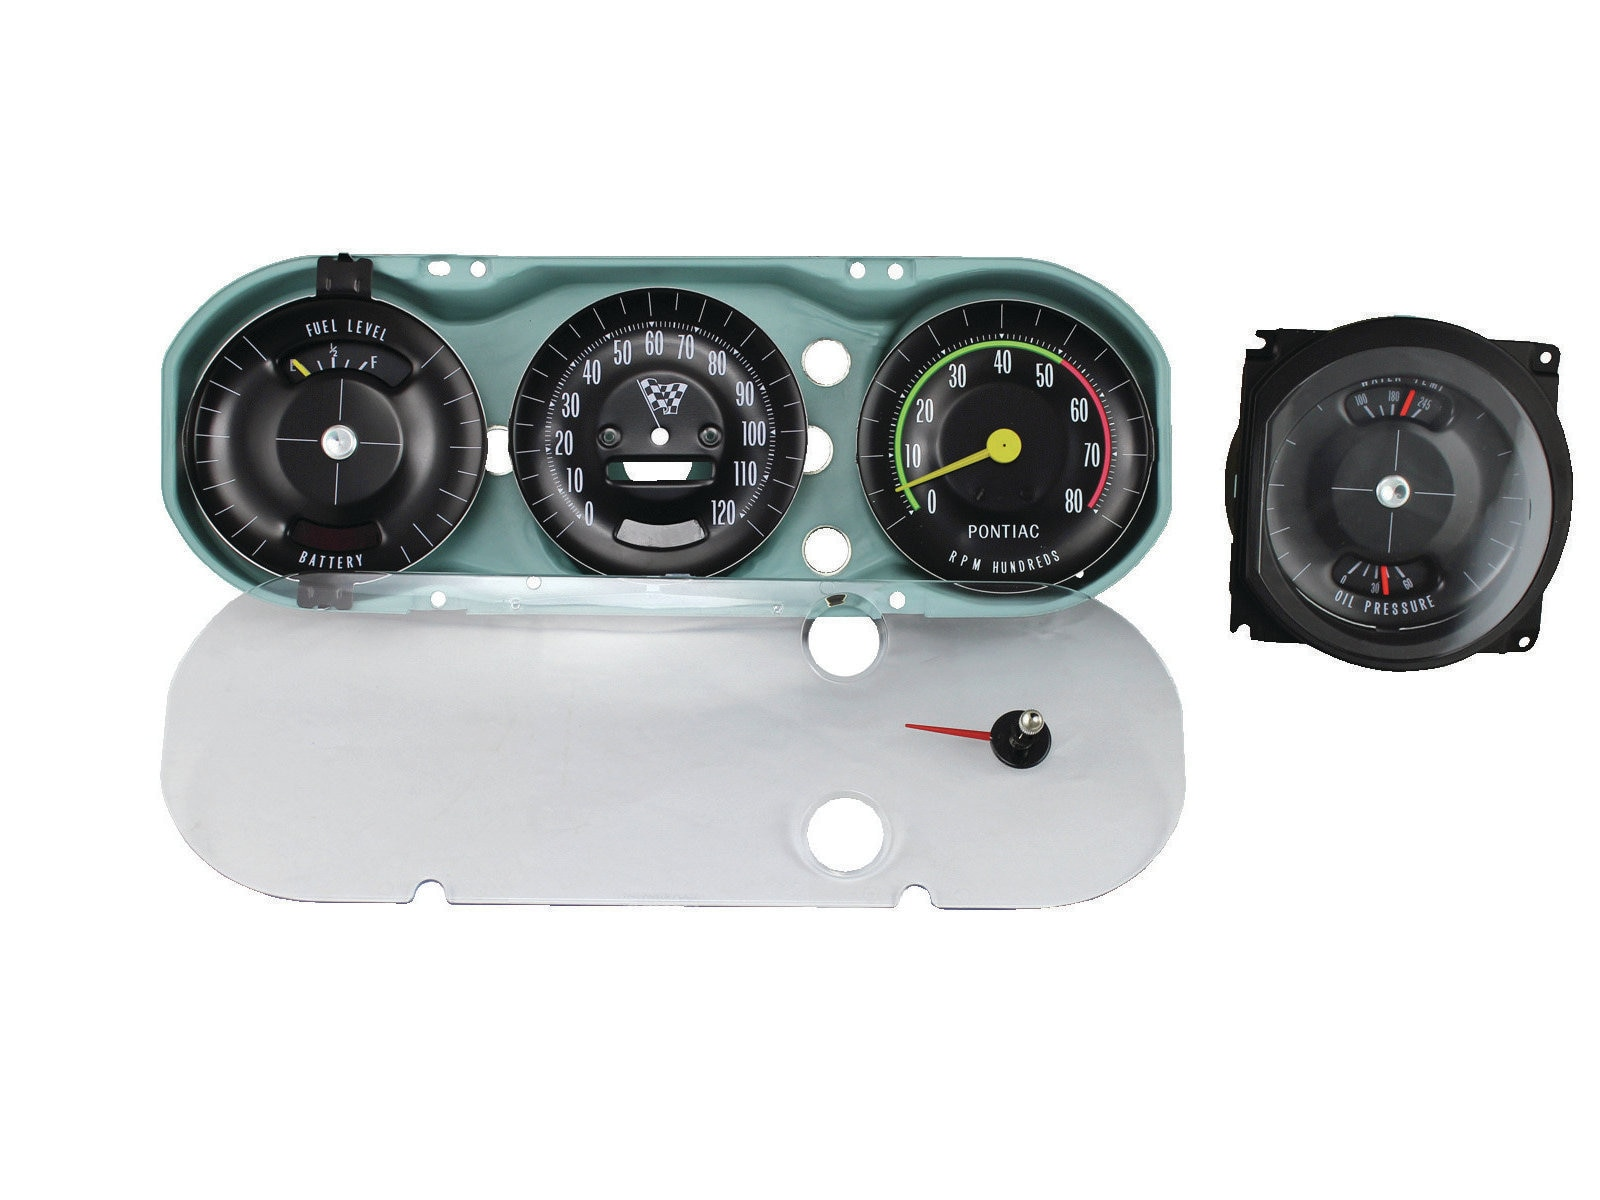 medium resolution of 1965 pontiac gto rally gauge wiring diagram wiring library 1965 gto rally gauges wiring diagram